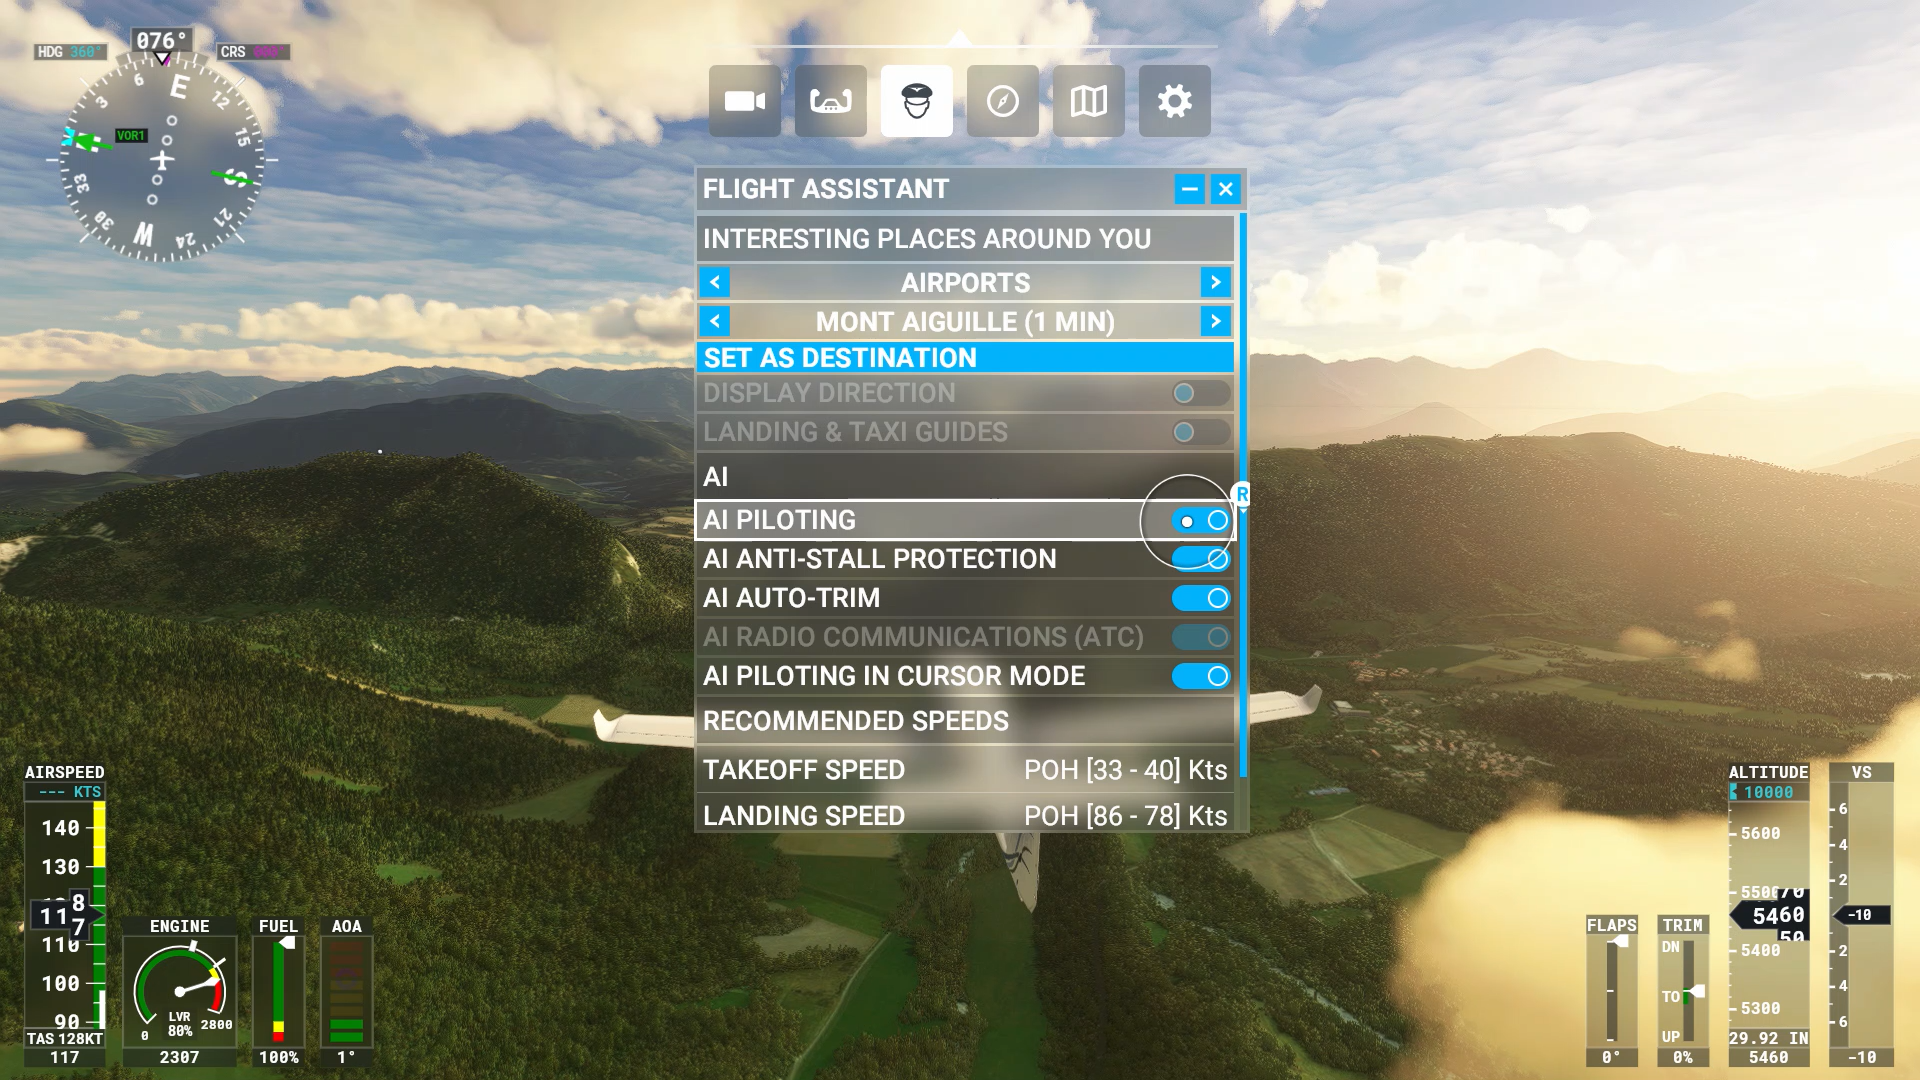 A screenshot of the Flight Assistant options.